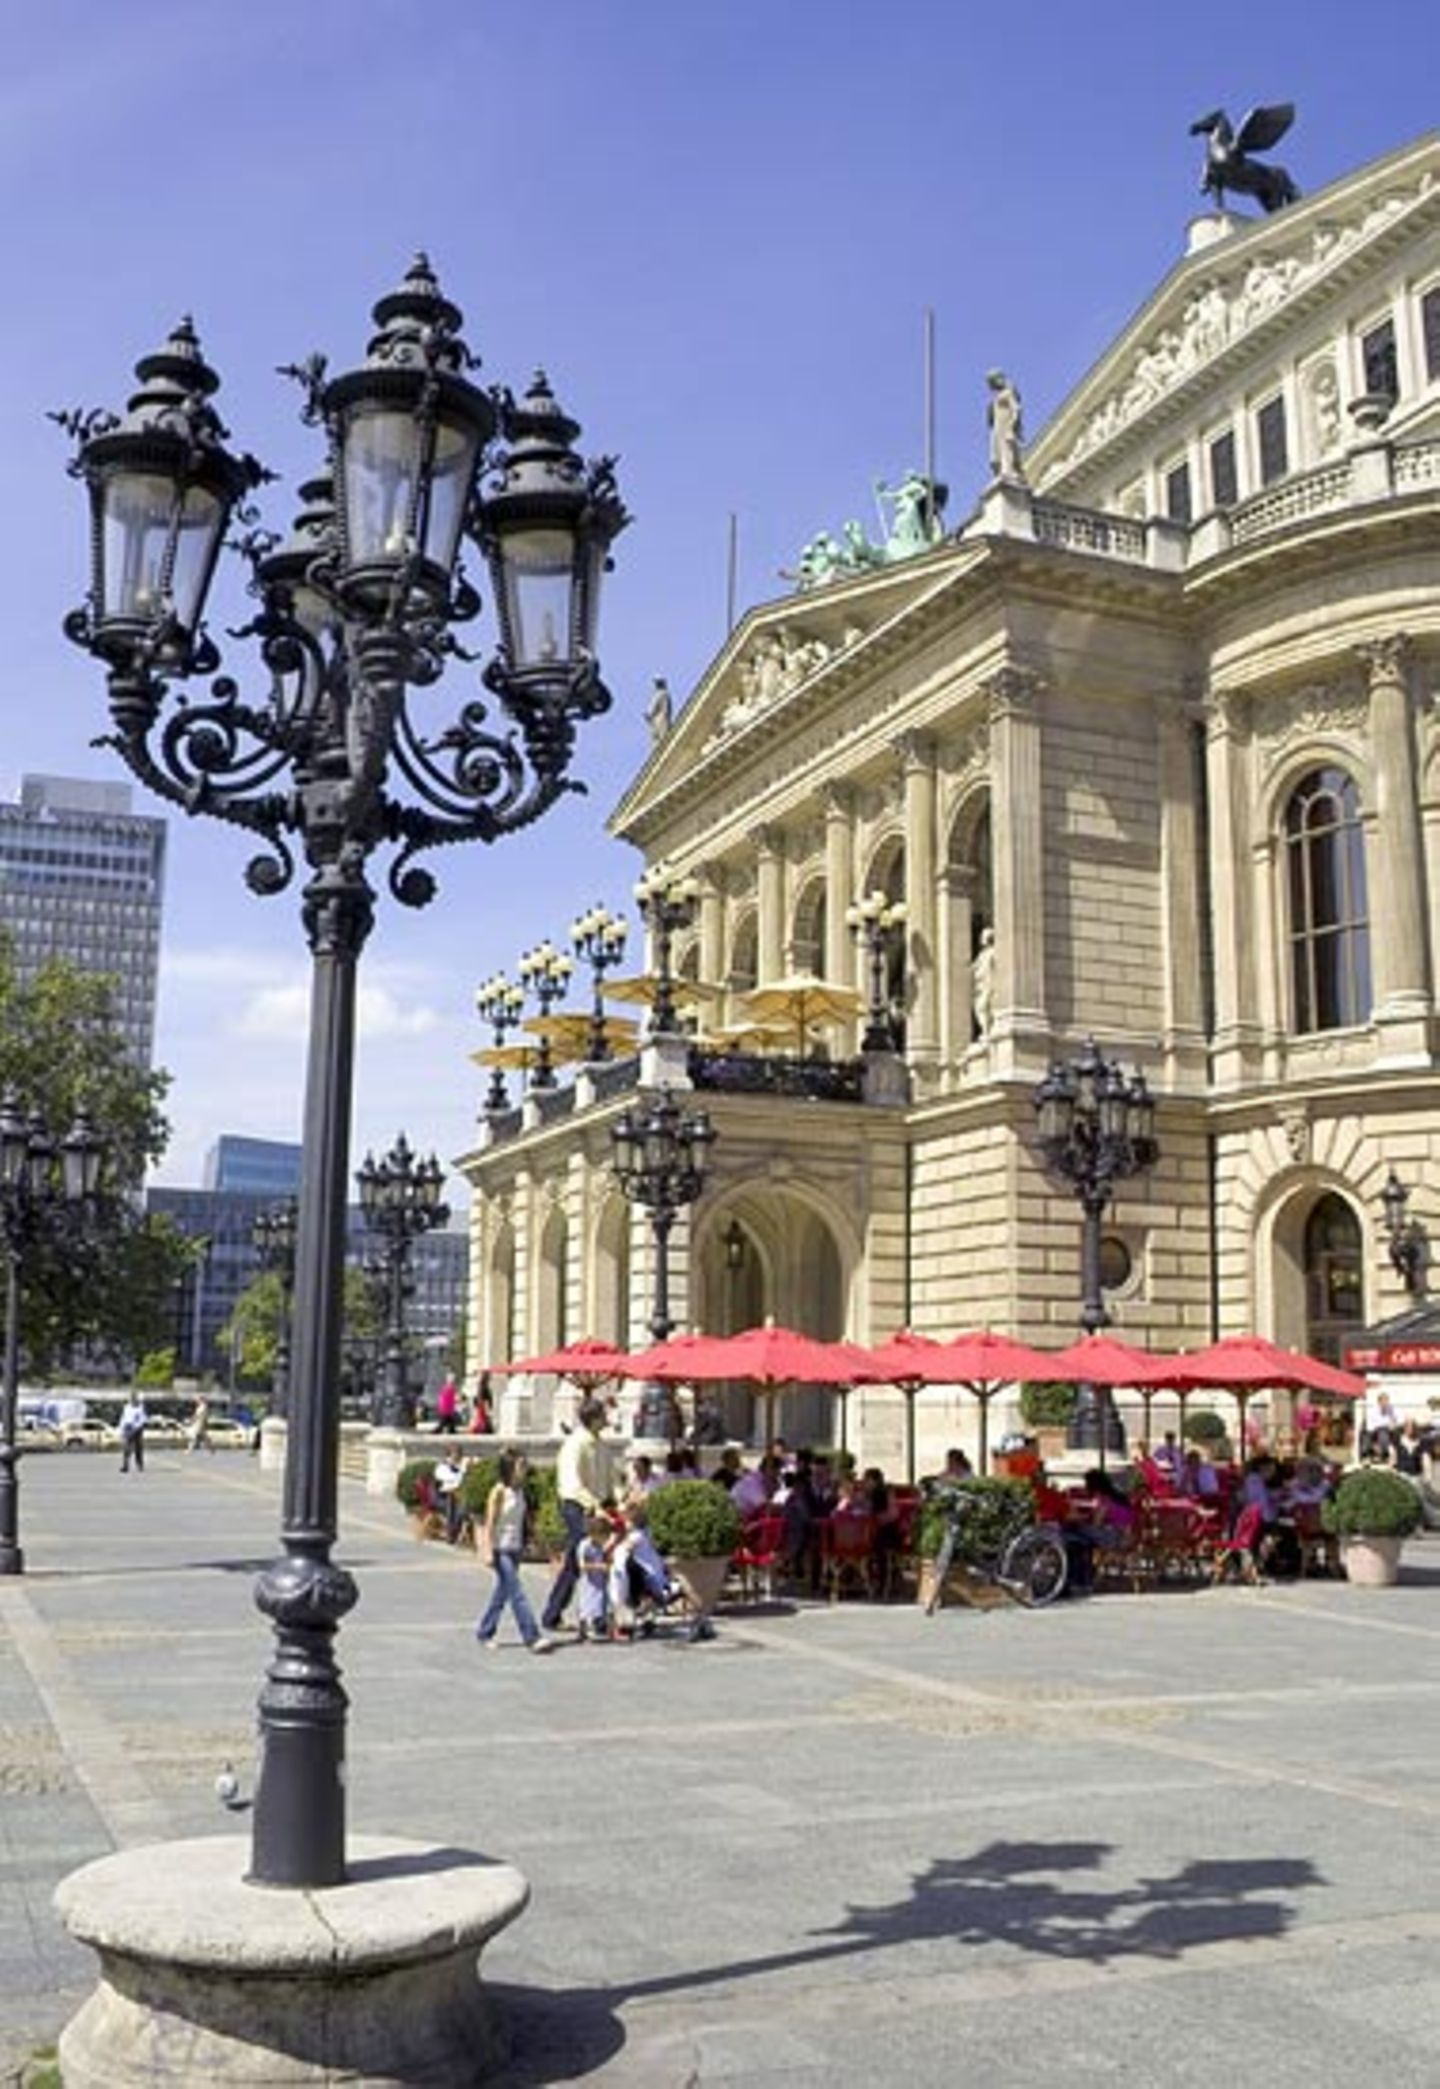 Fotogalerie: Frankfurt am Main